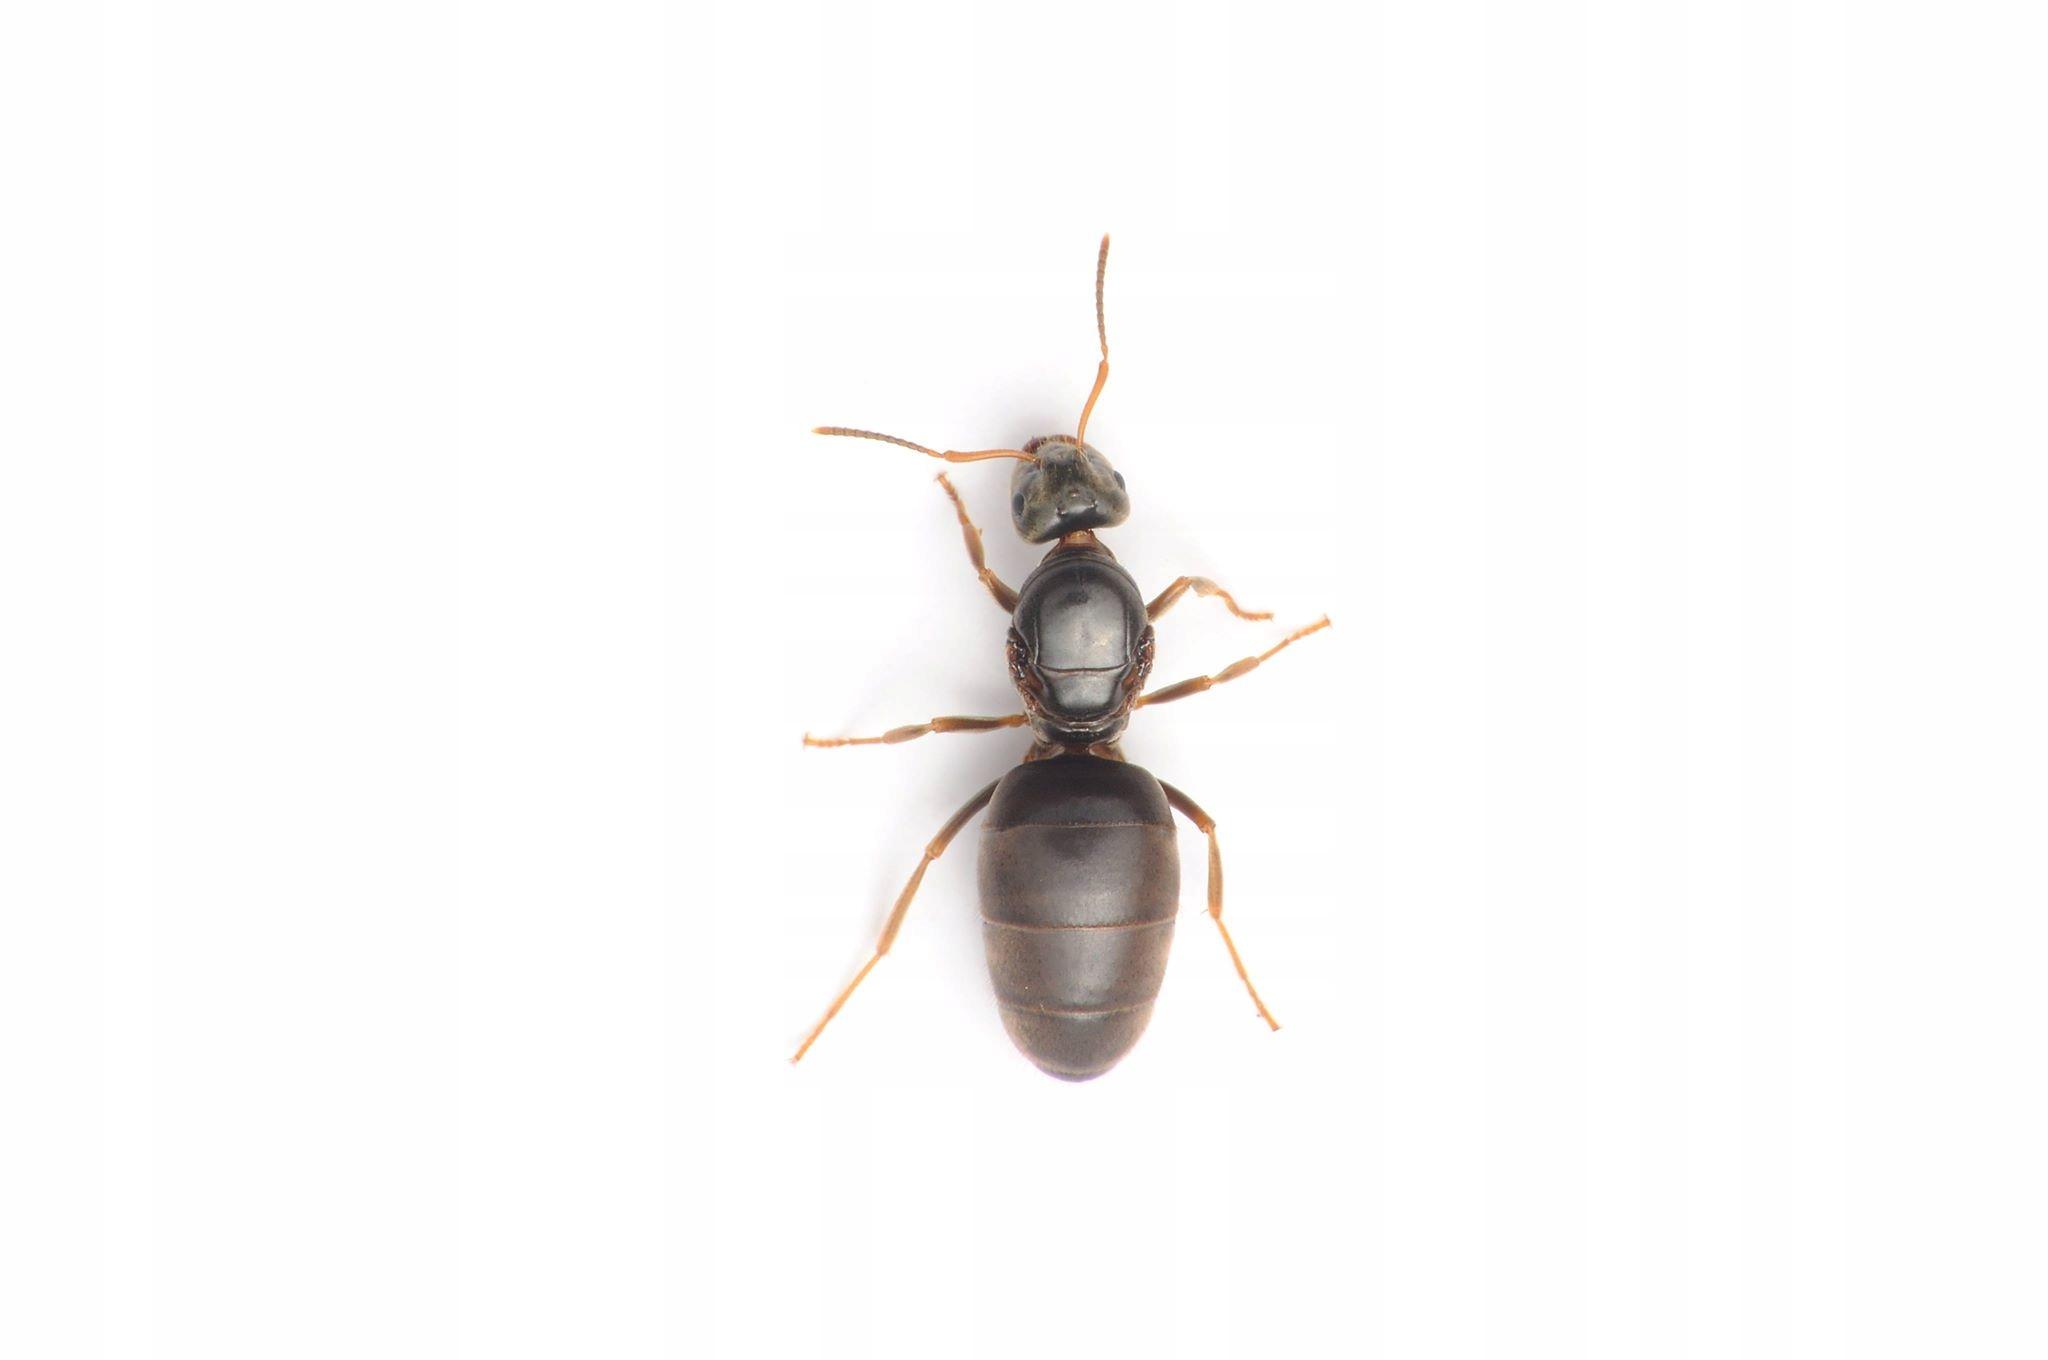 Lasius niger Królowa +robo, mrówki do formikarium.